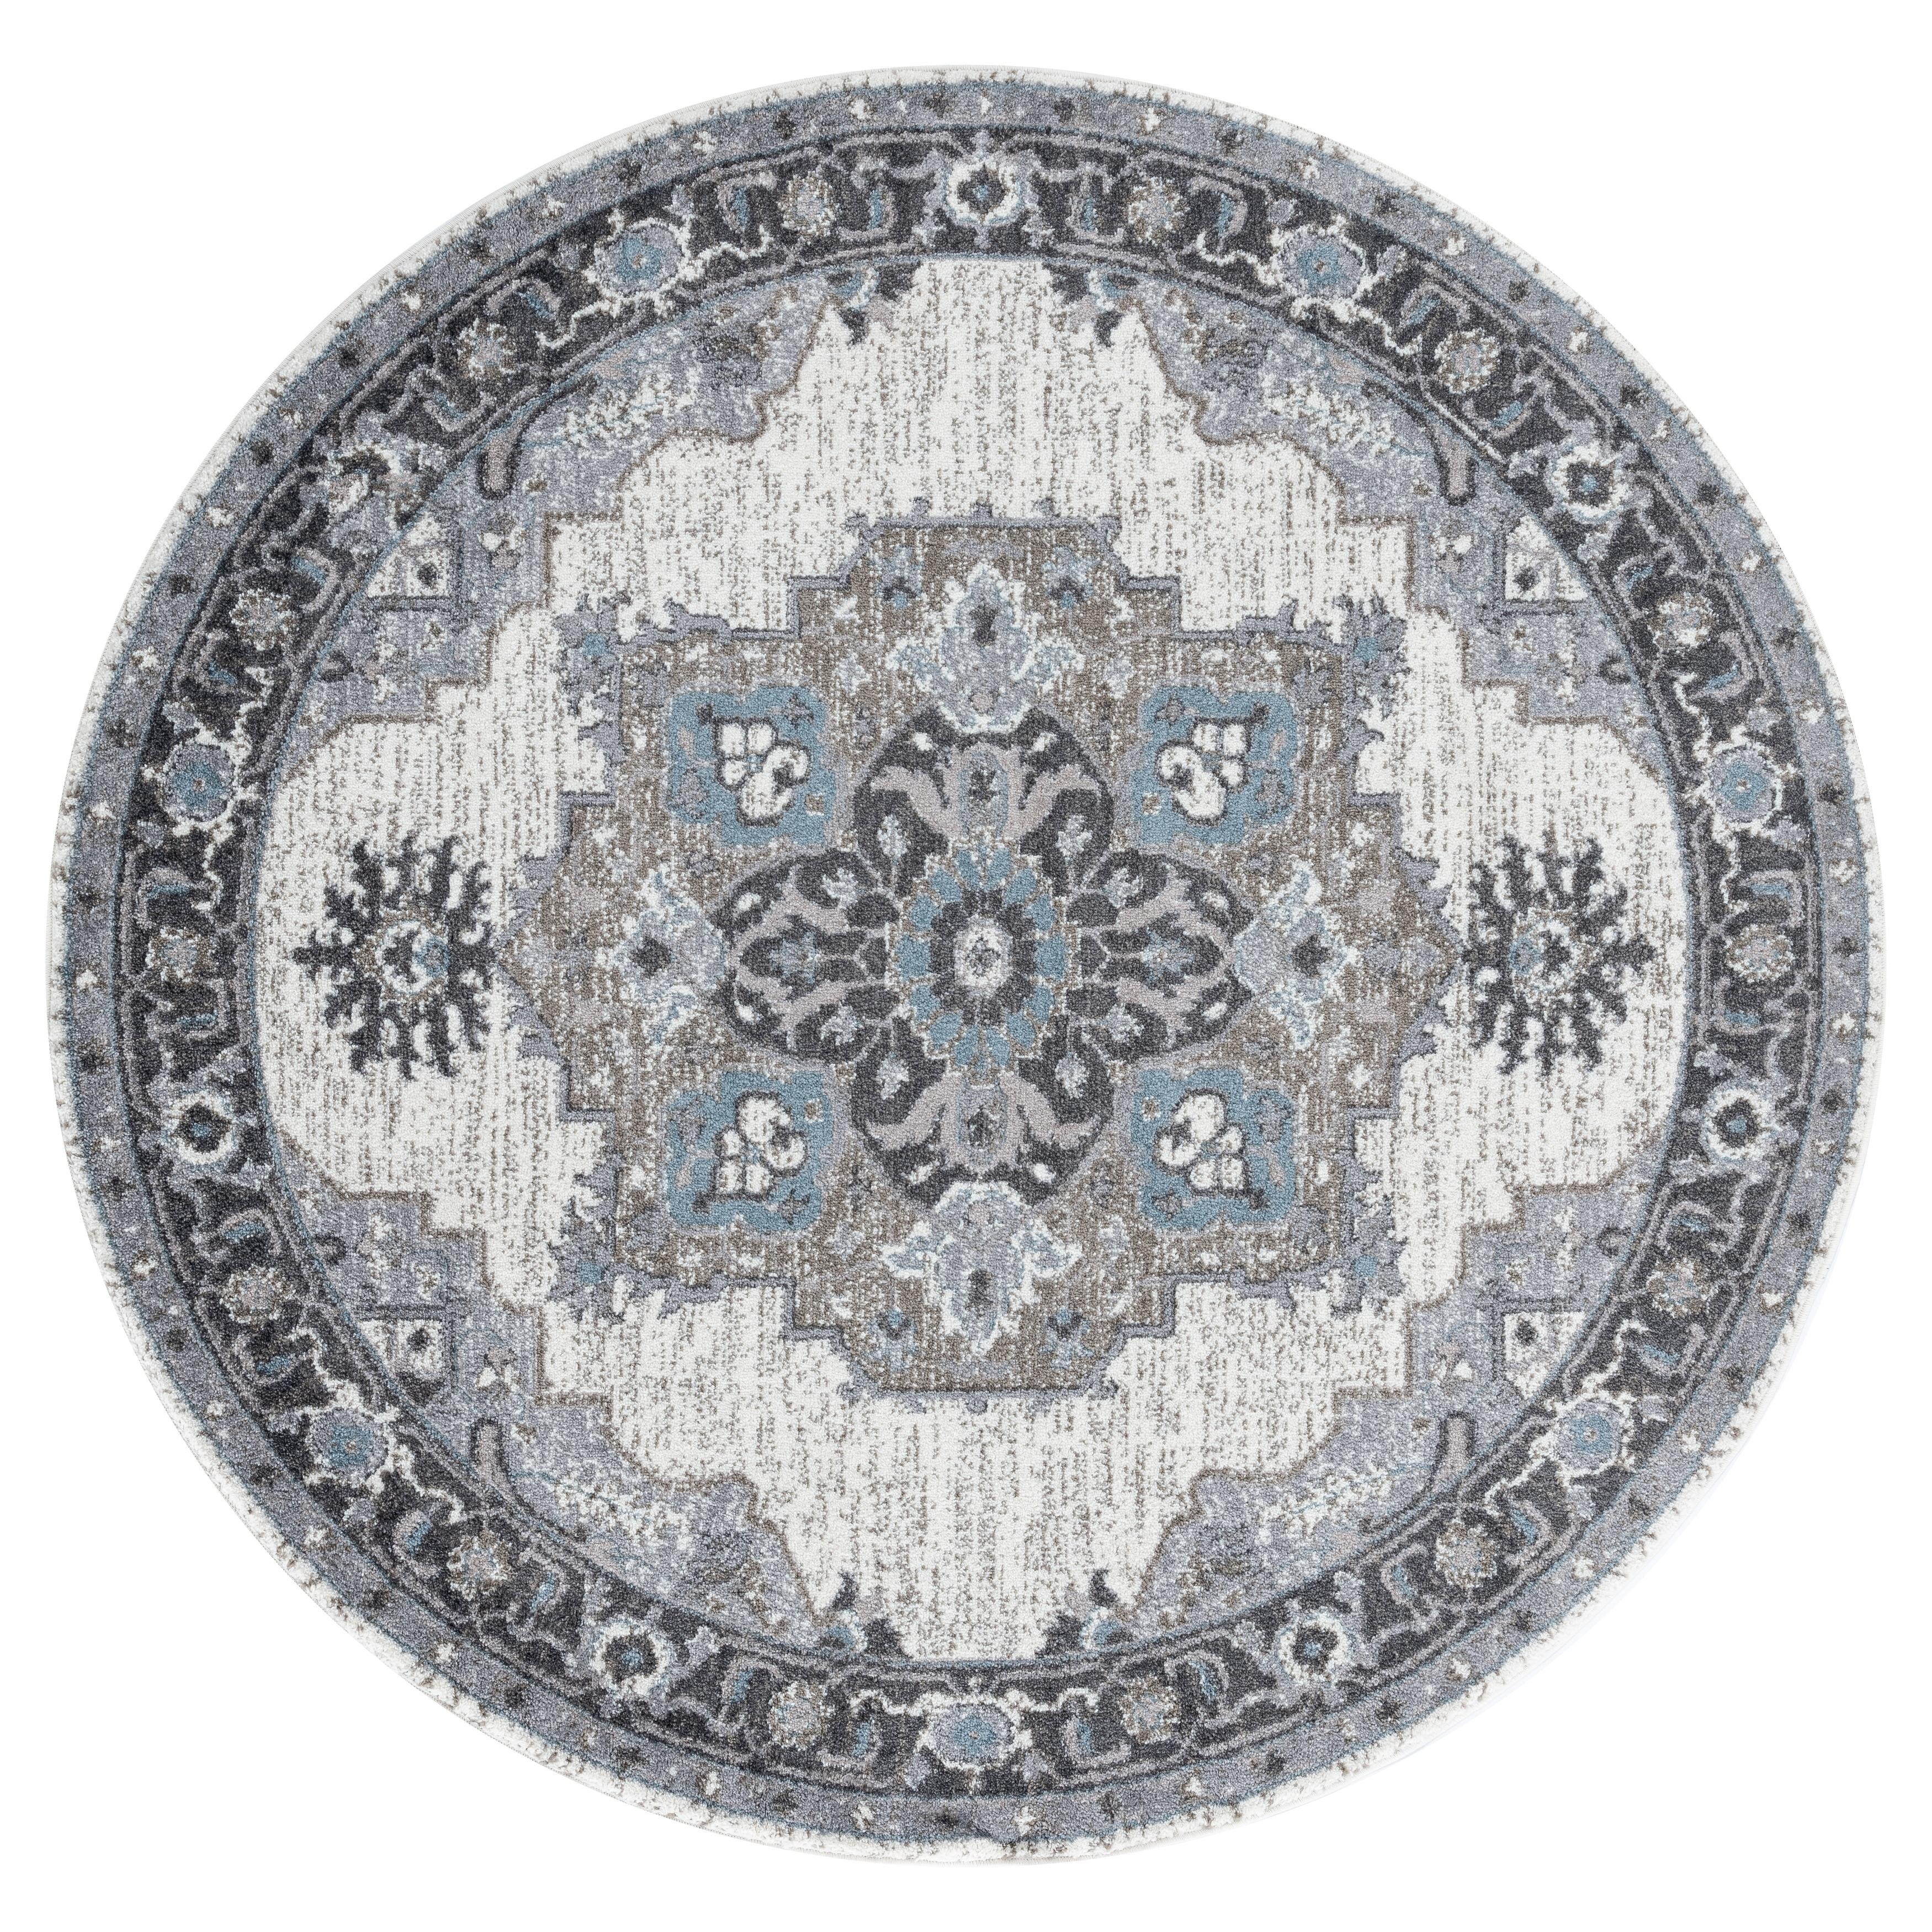 Aurelia Wilton-woven Transitional Light Gray Round Rug - 6 x 6 (Light Grey - 6 x 6)